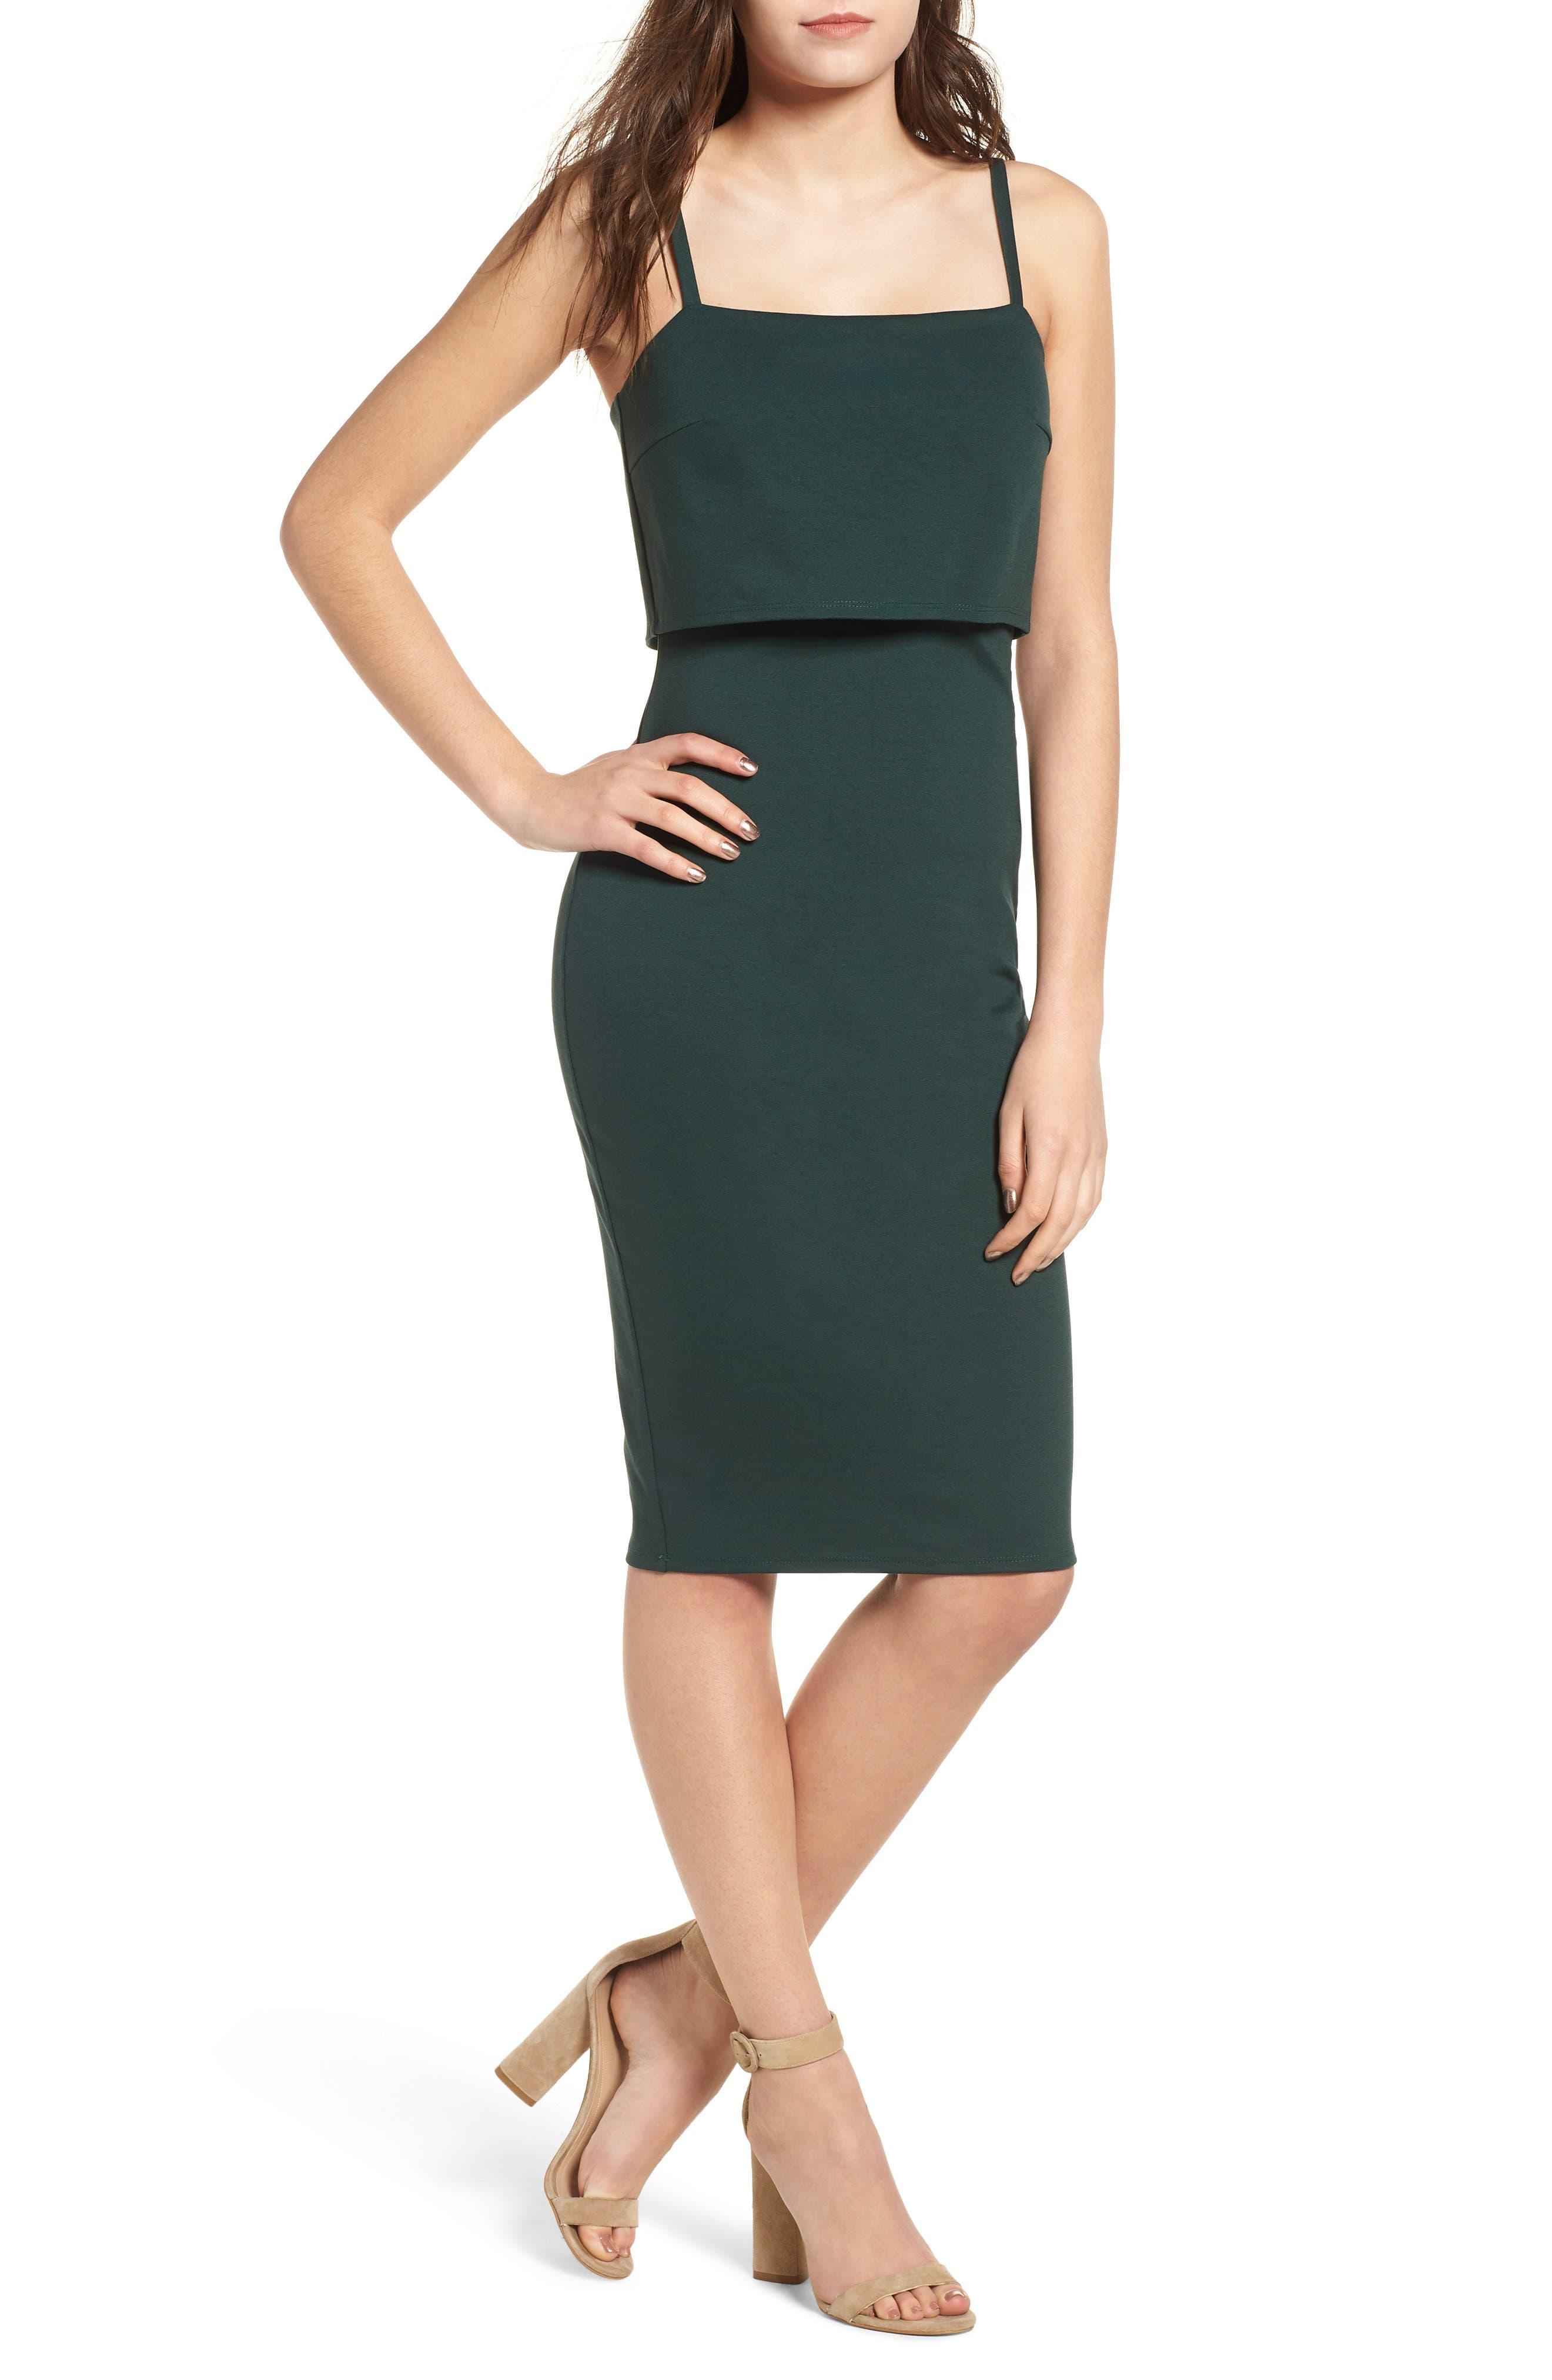 Green Knee Length Dress